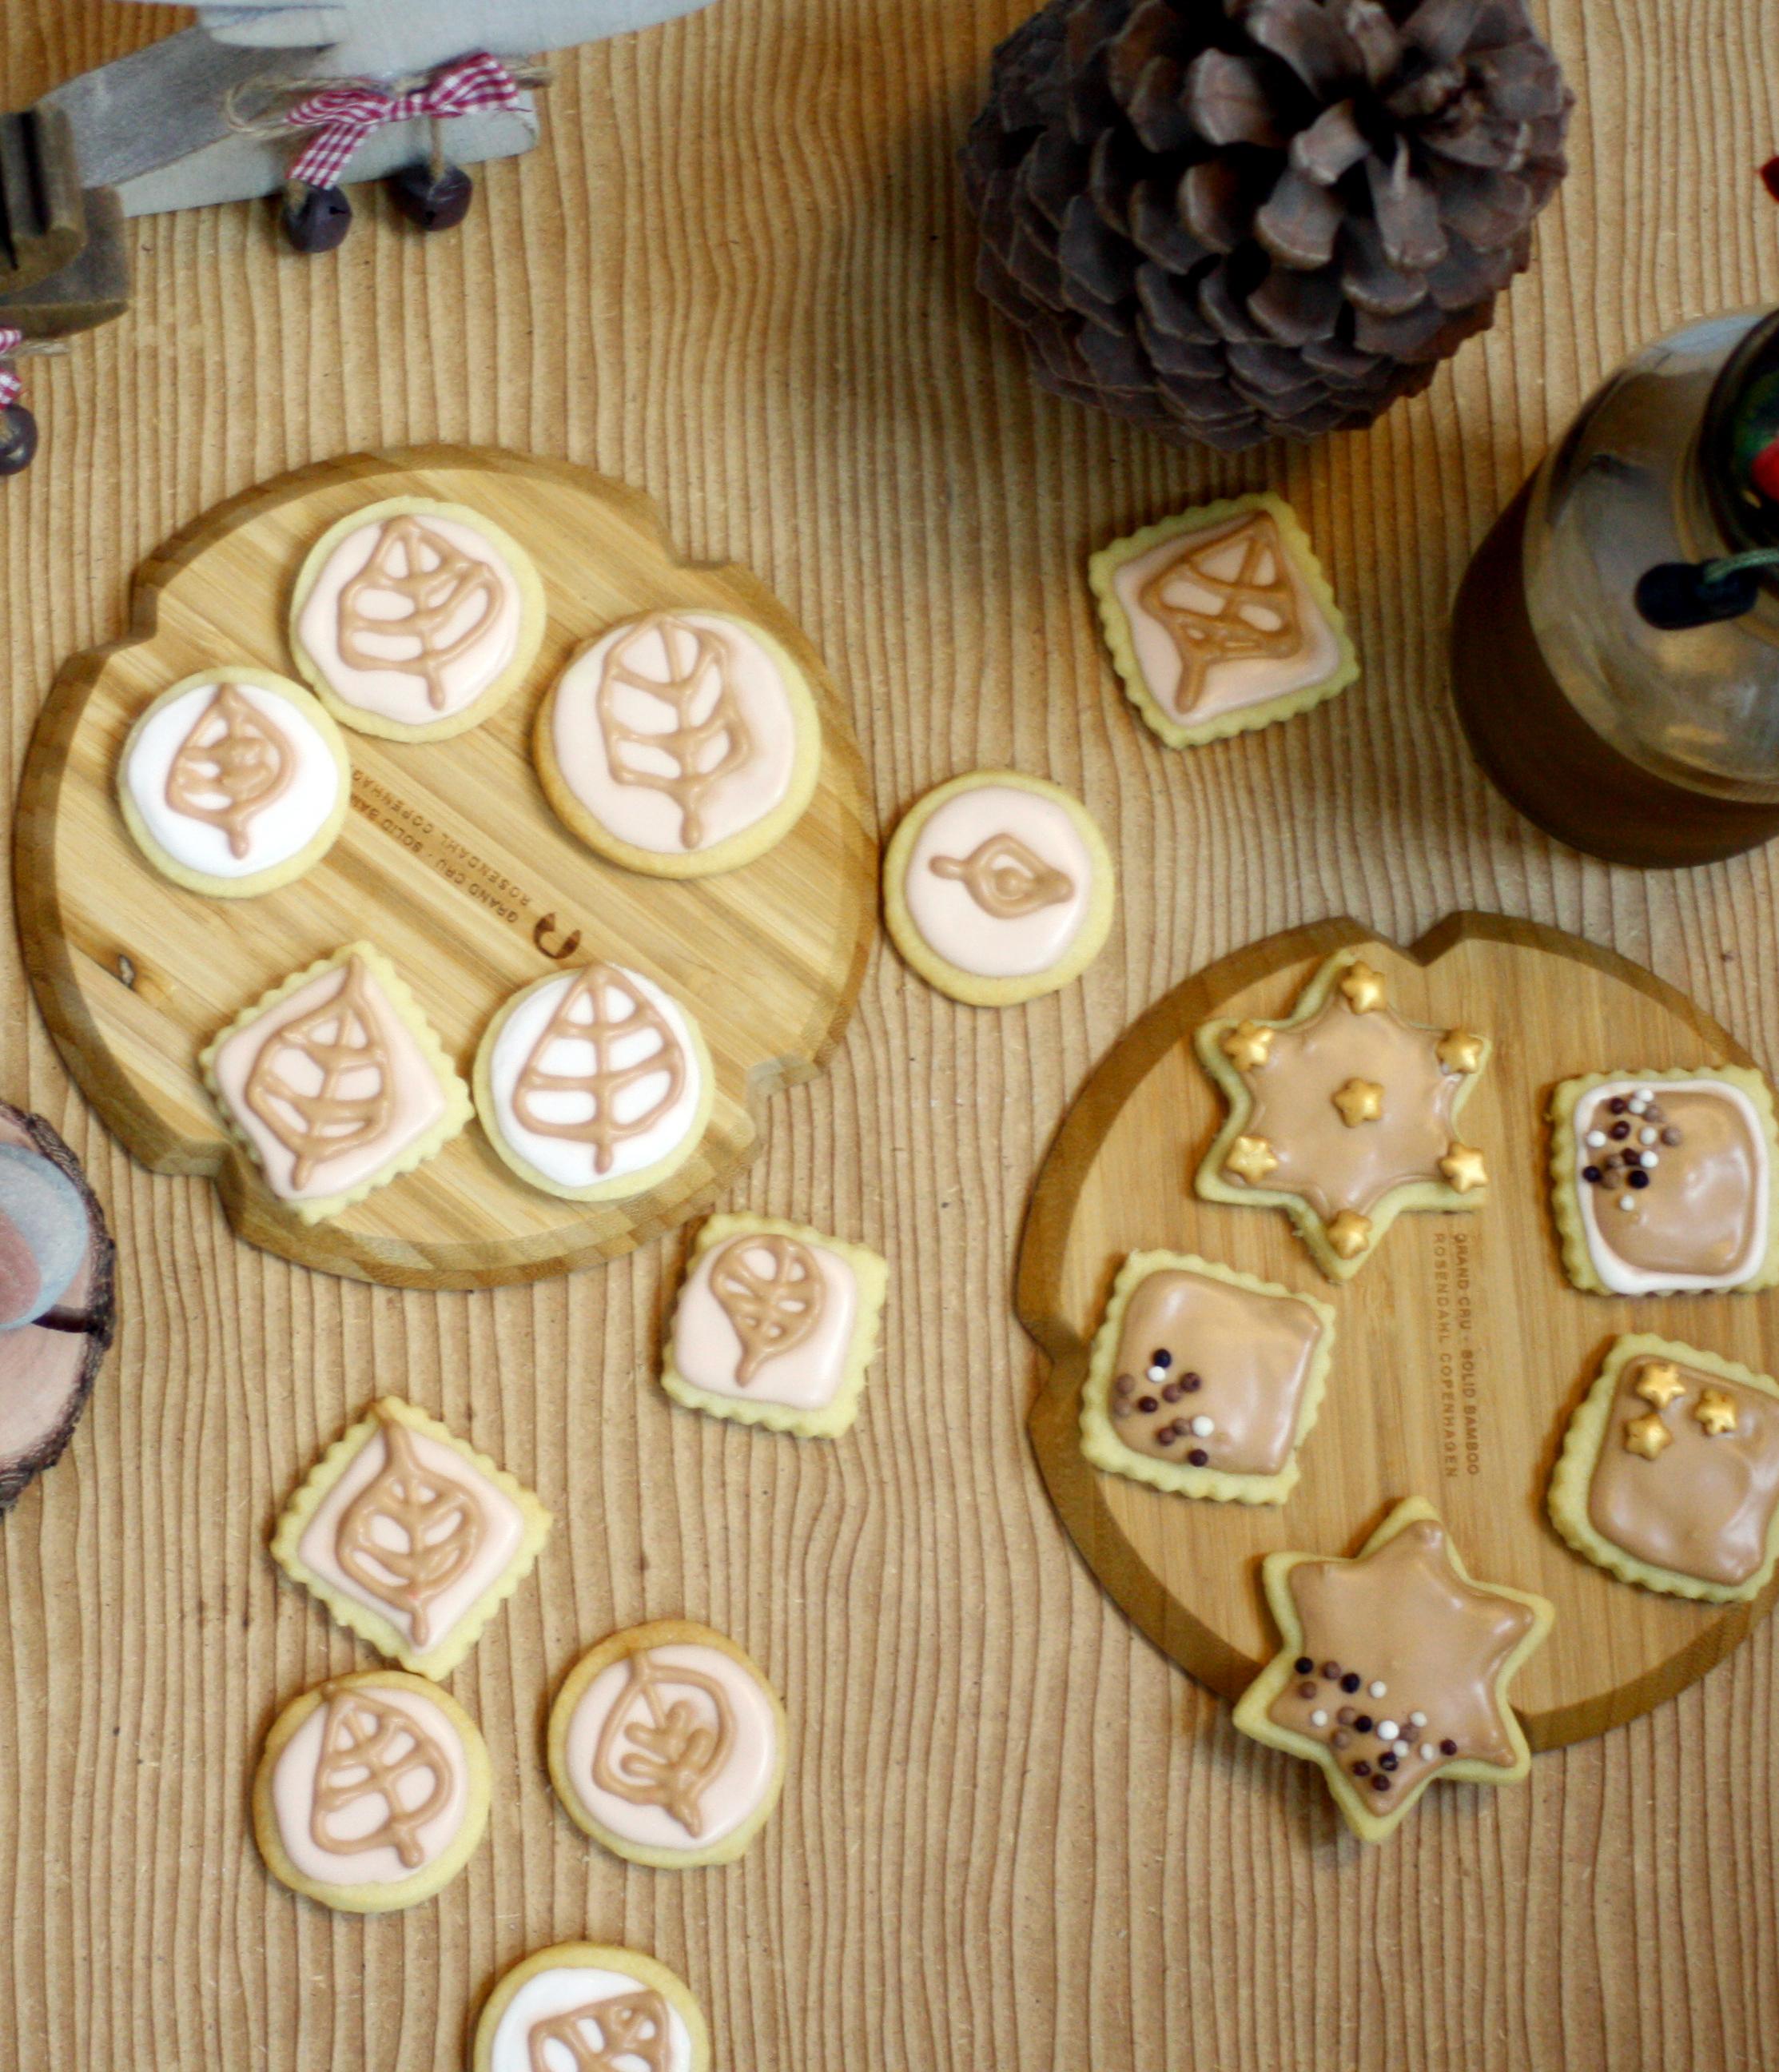 Herbst Mürbekekse // Autumn Cookies with royal icing by http://babyrockmyday.com/herbst-muerbekekse/